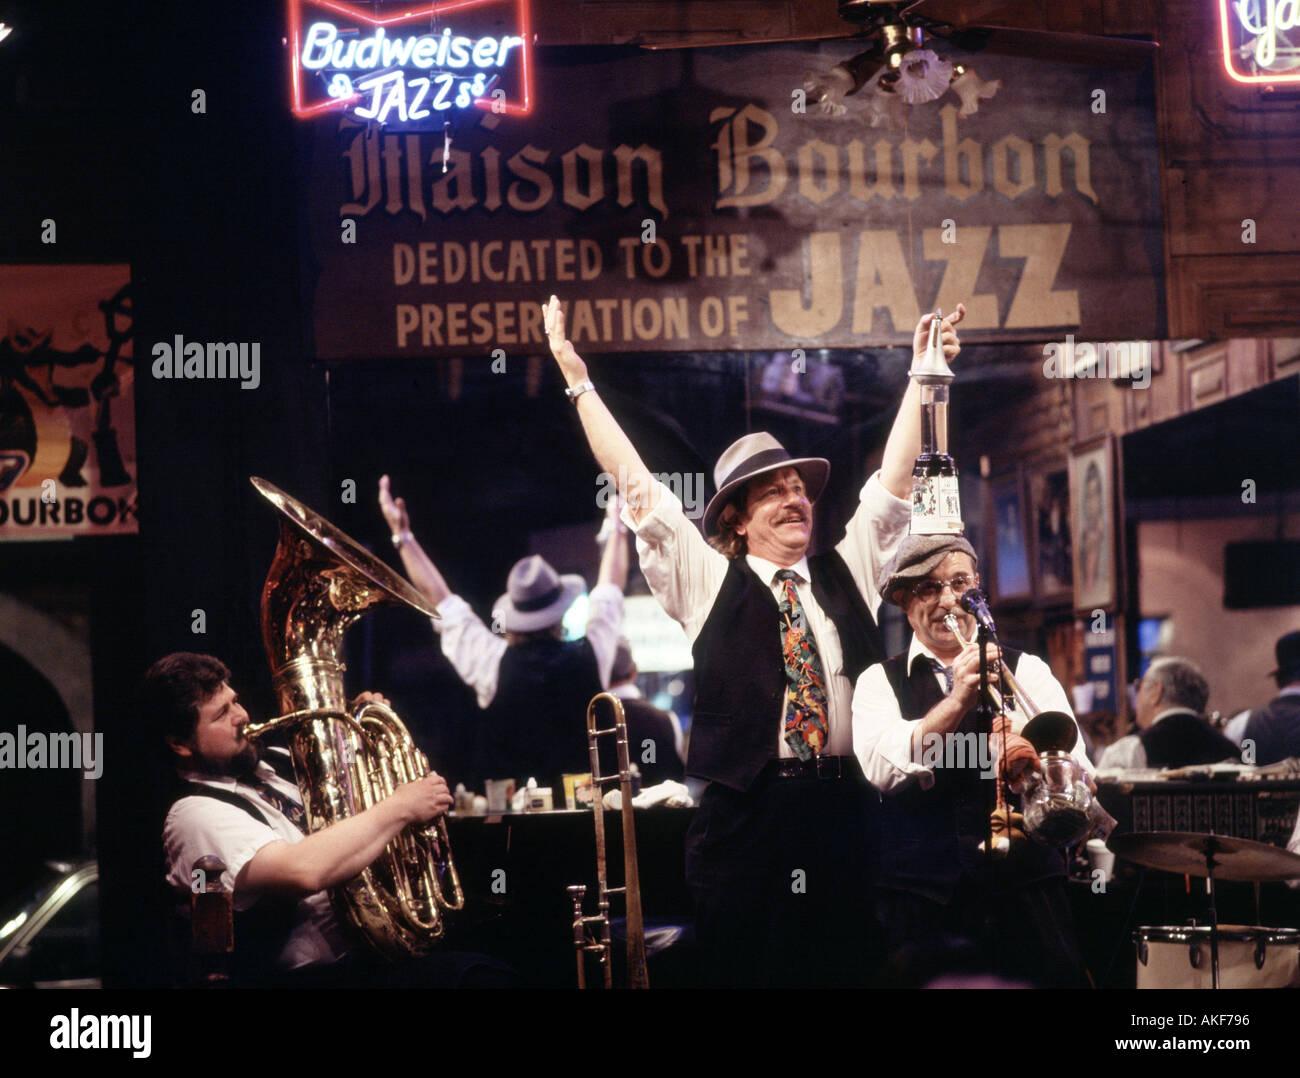 New Orleans Bourbon Jazz Club - Stock Image